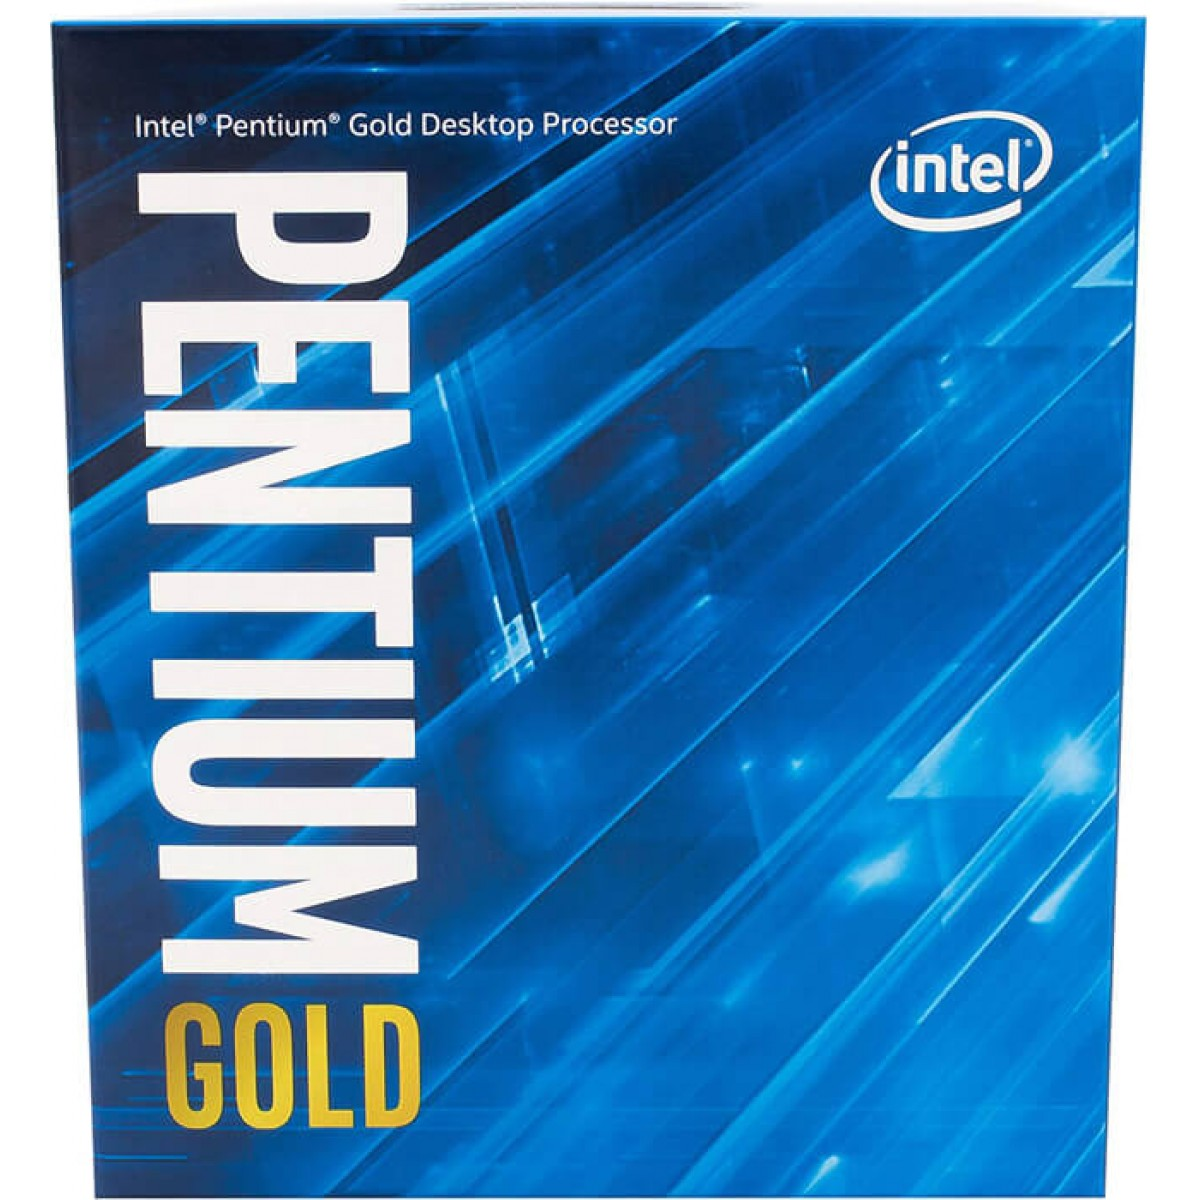 Processador Intel Pentium Gold G5420 3.8GHz 4MB, 8ª Geração, Coffee Lake, LGA 1151, BX80684G5420 - Open Box